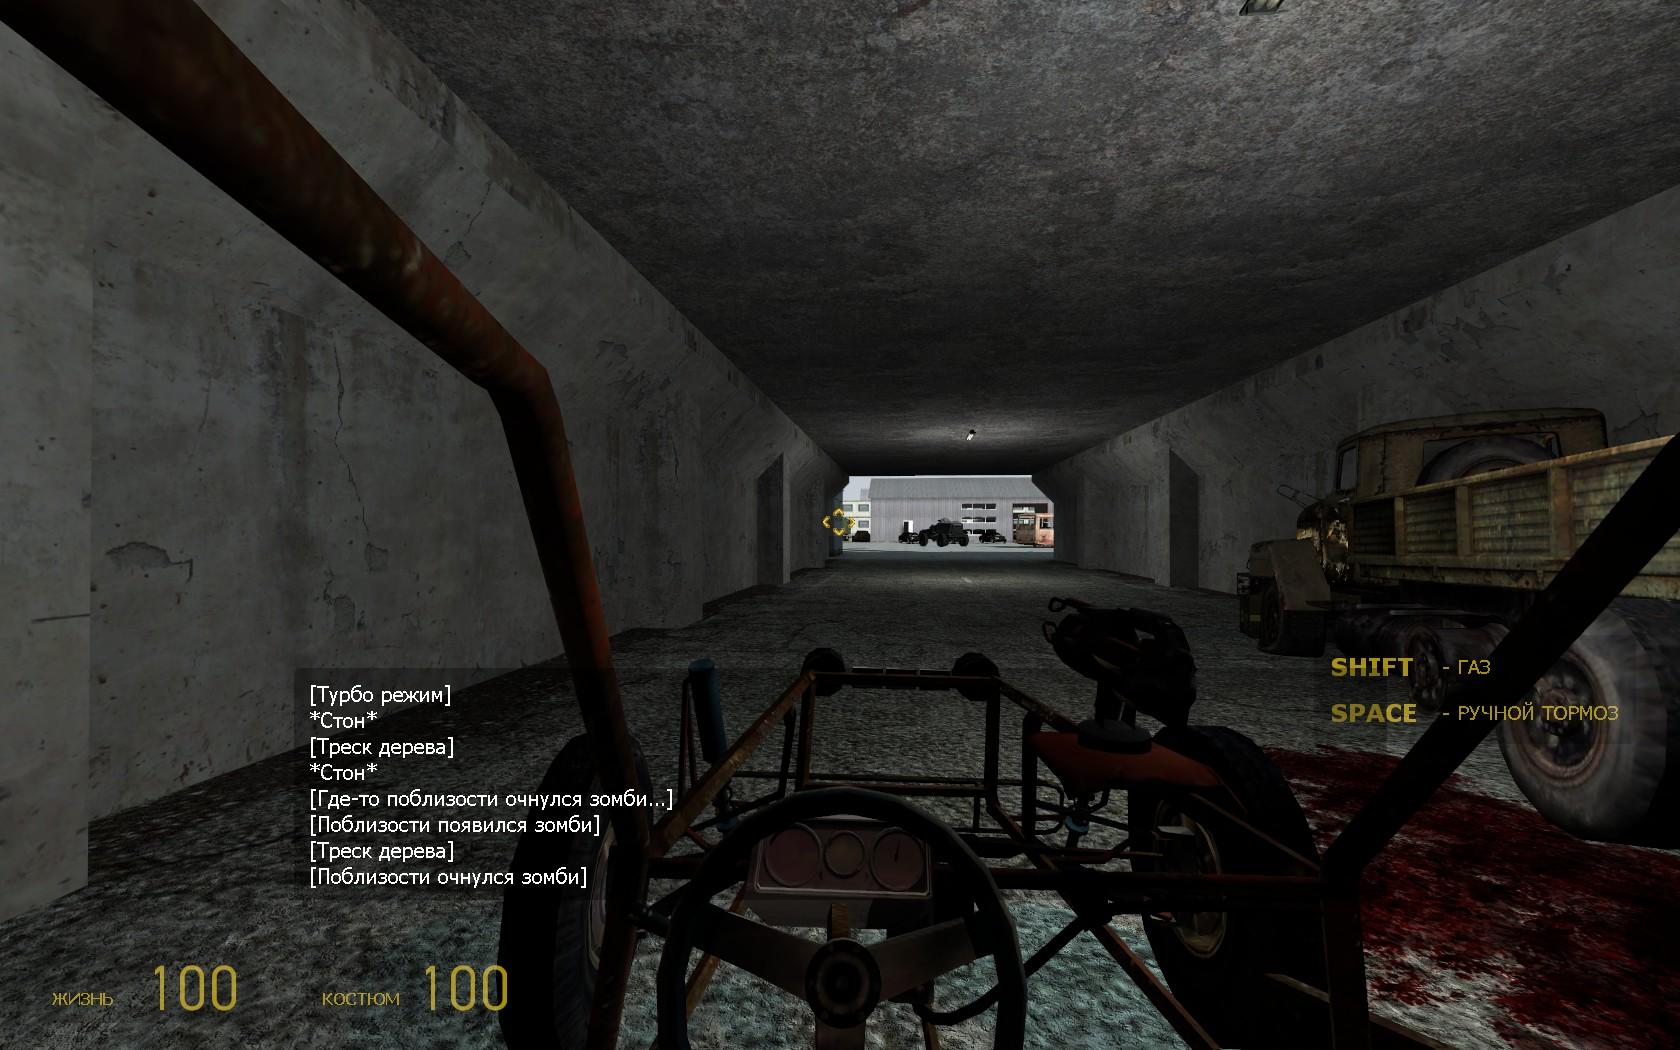 way020019 - Half-Life 2 way020019